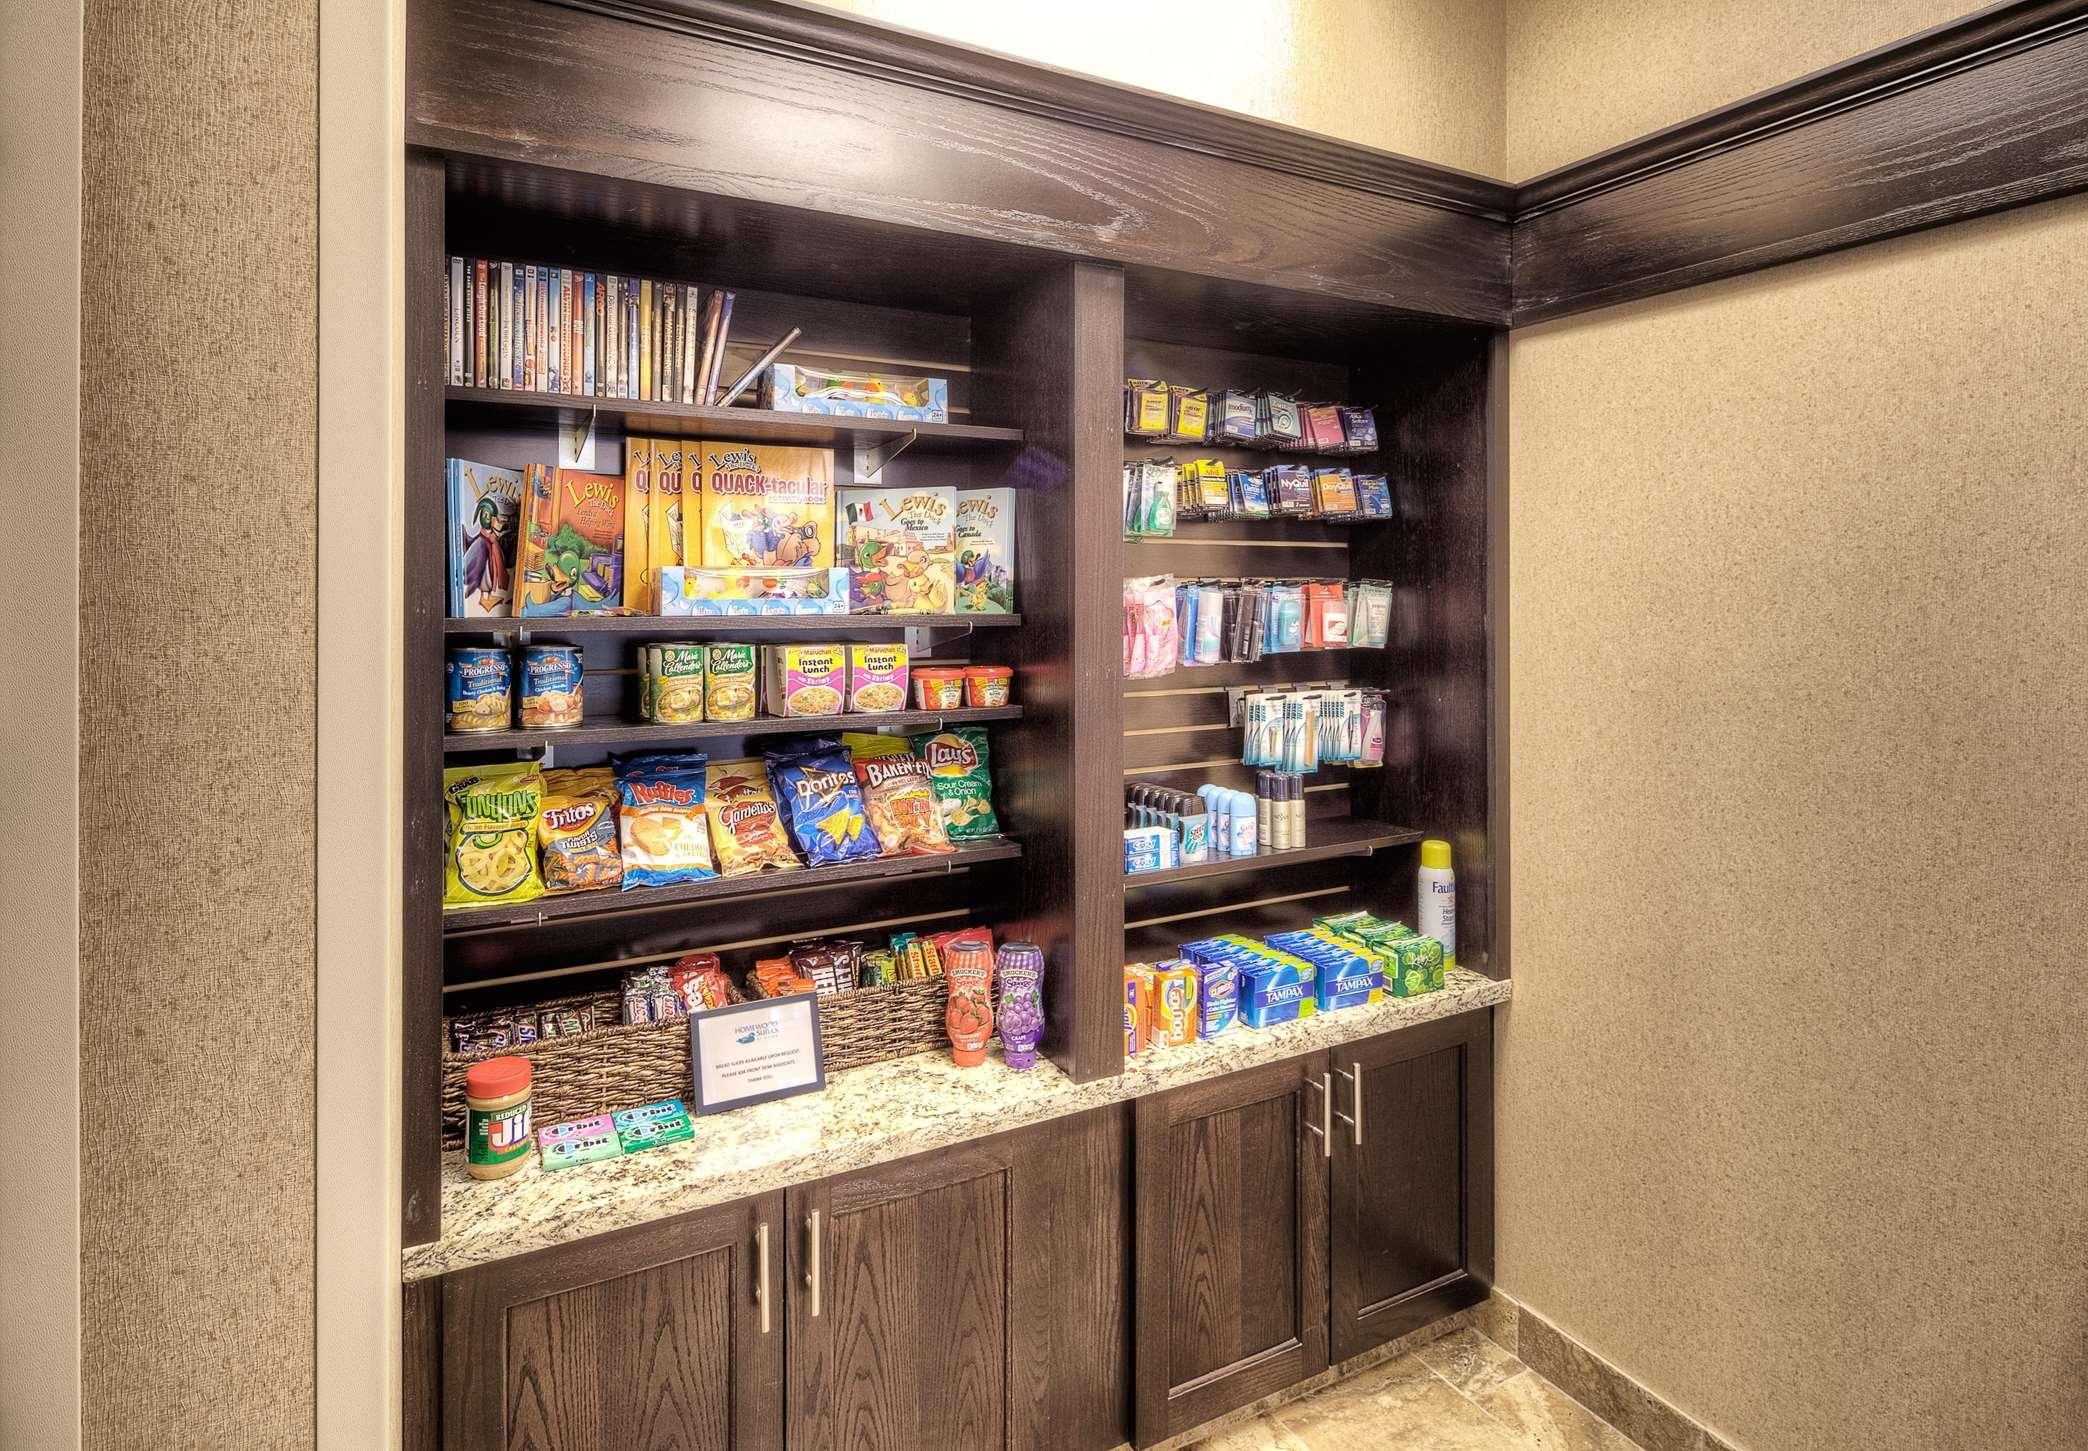 Homewood Suites by Hilton Victoria, TX image 12